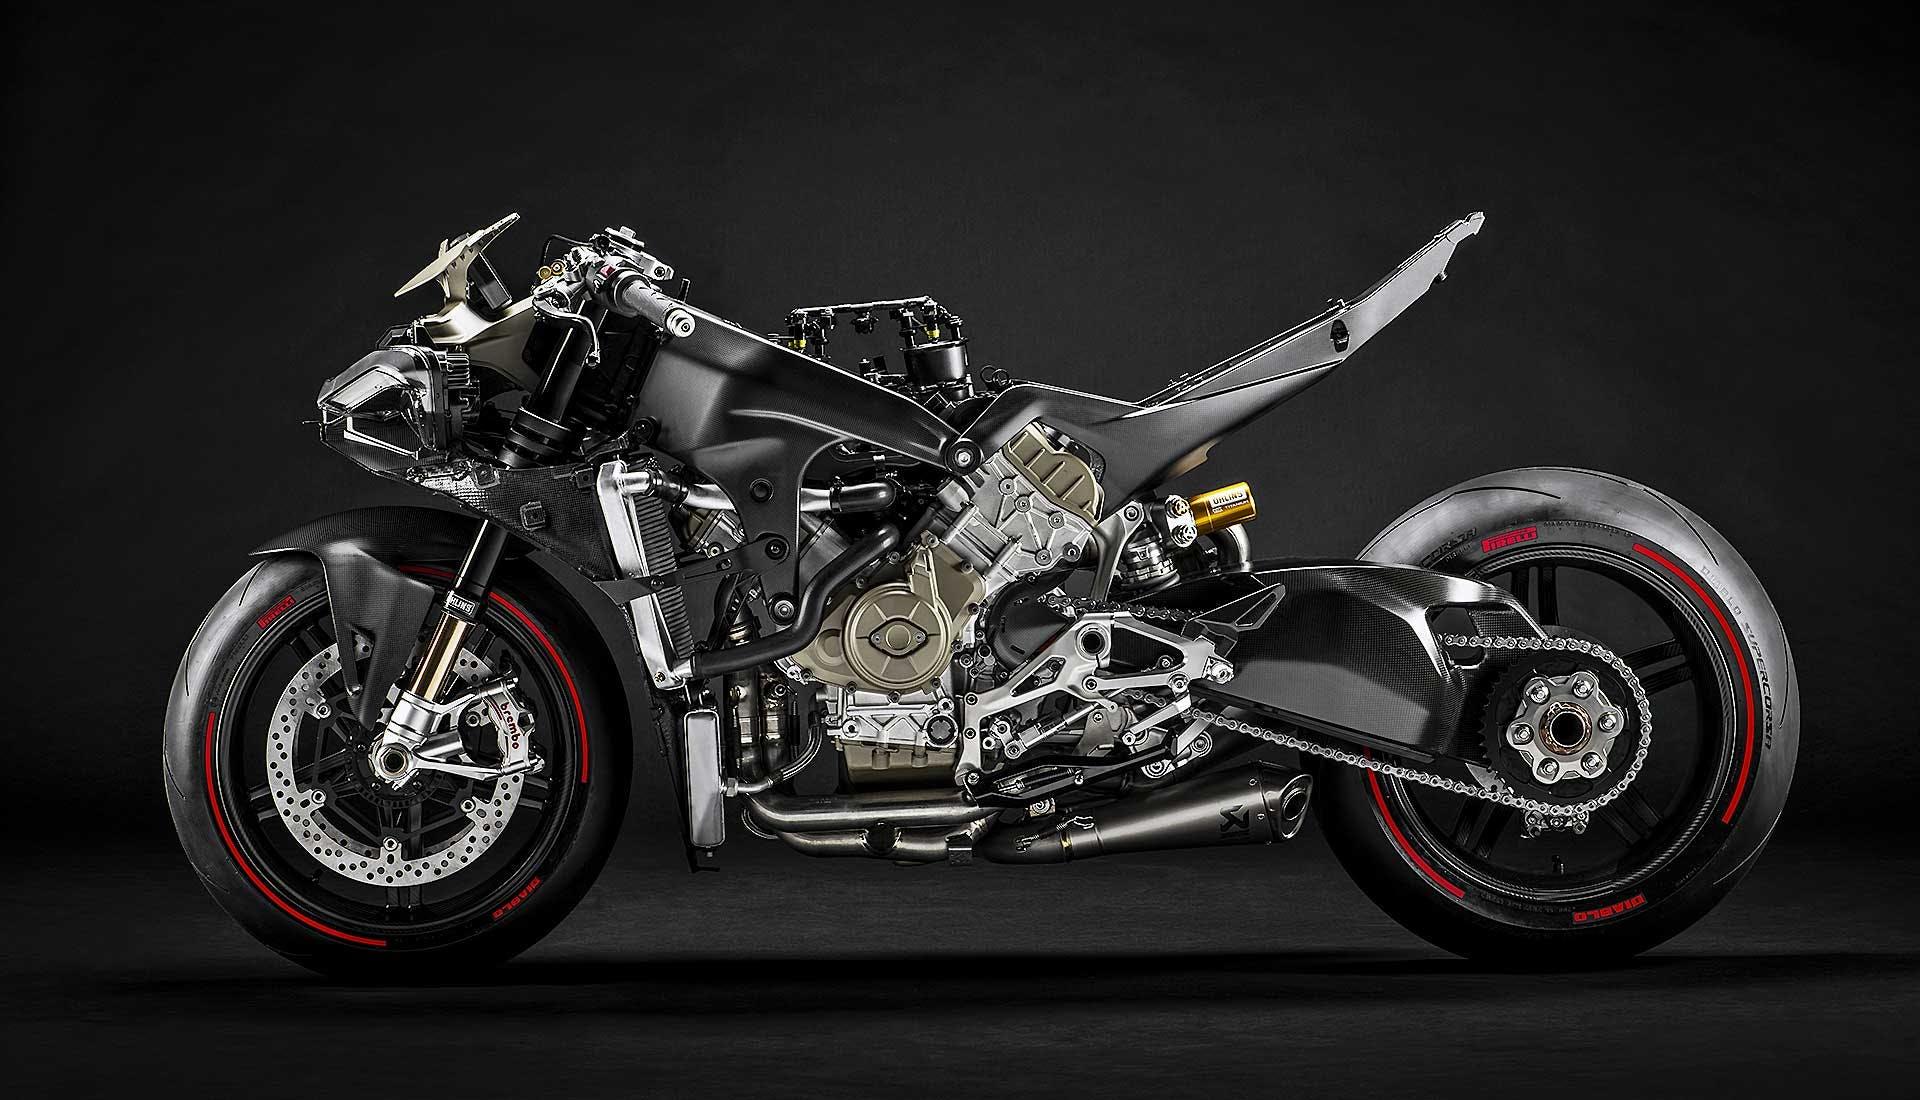 Ducati Superleggera V4 moto nuda senza carena